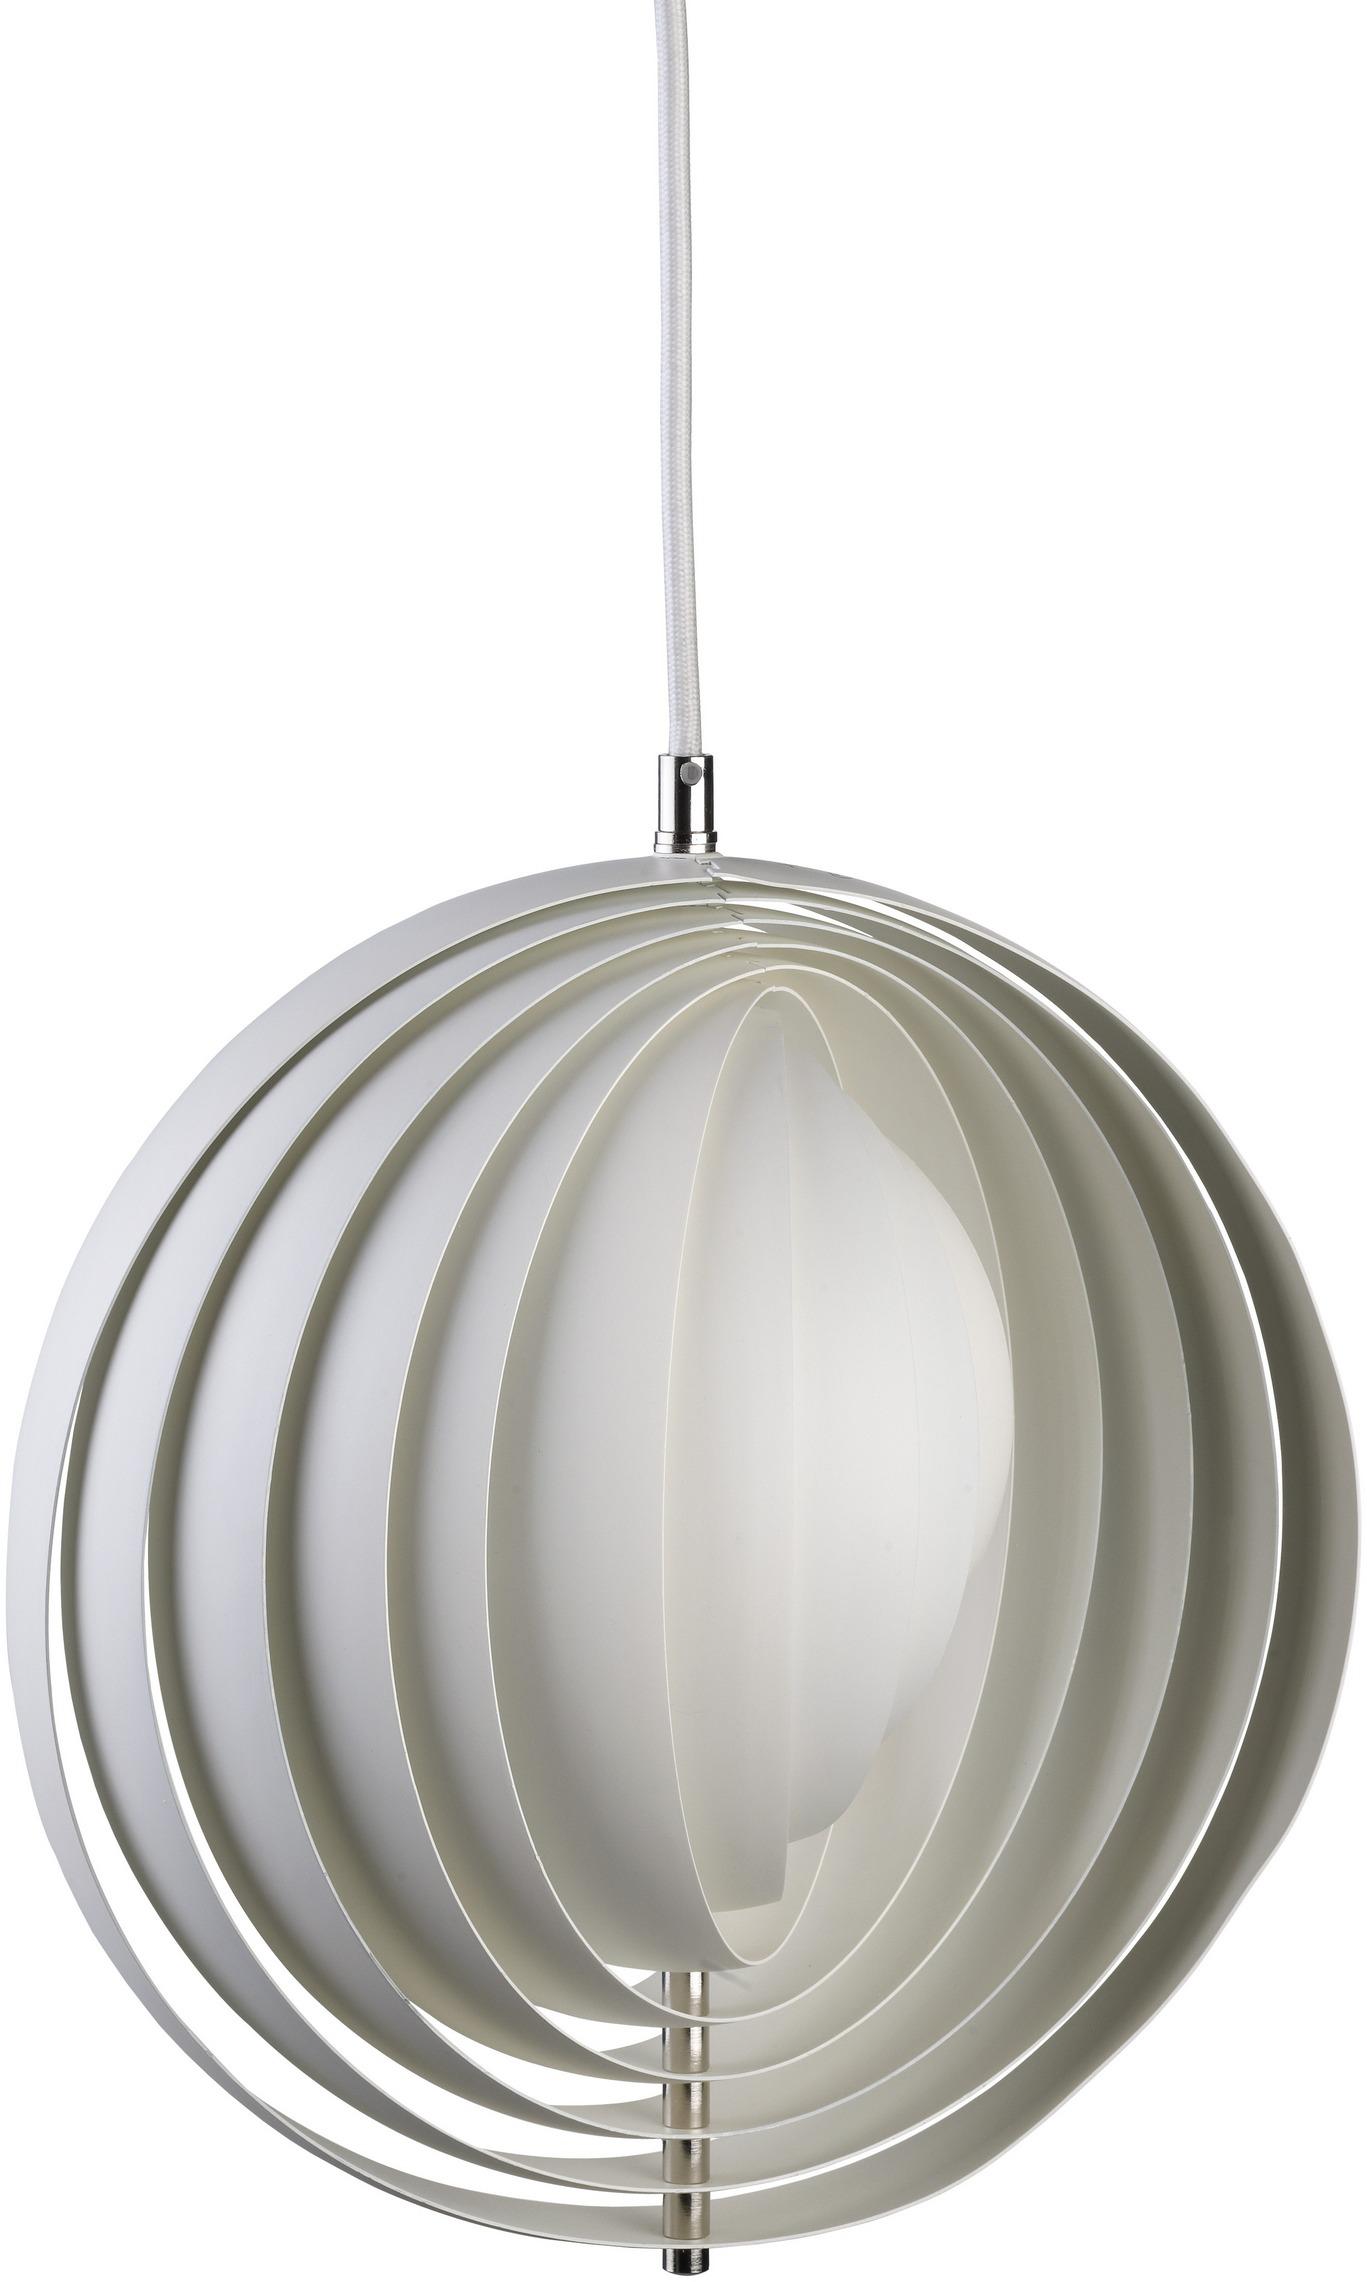 LAMPA WISZĄCA MOON -30%